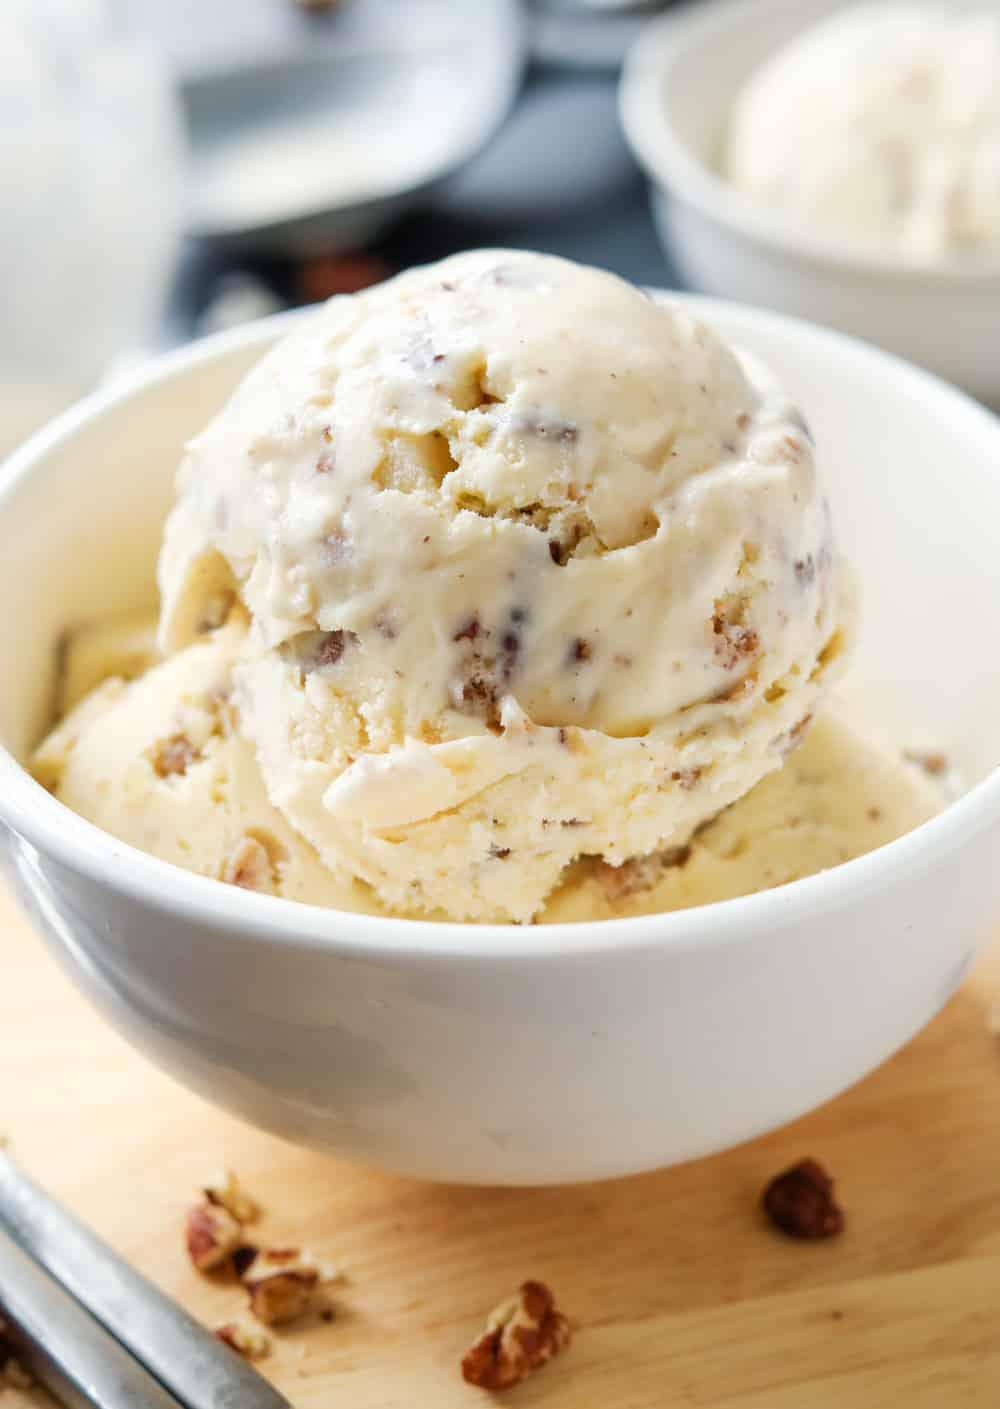 Ice cream in a white bowl.